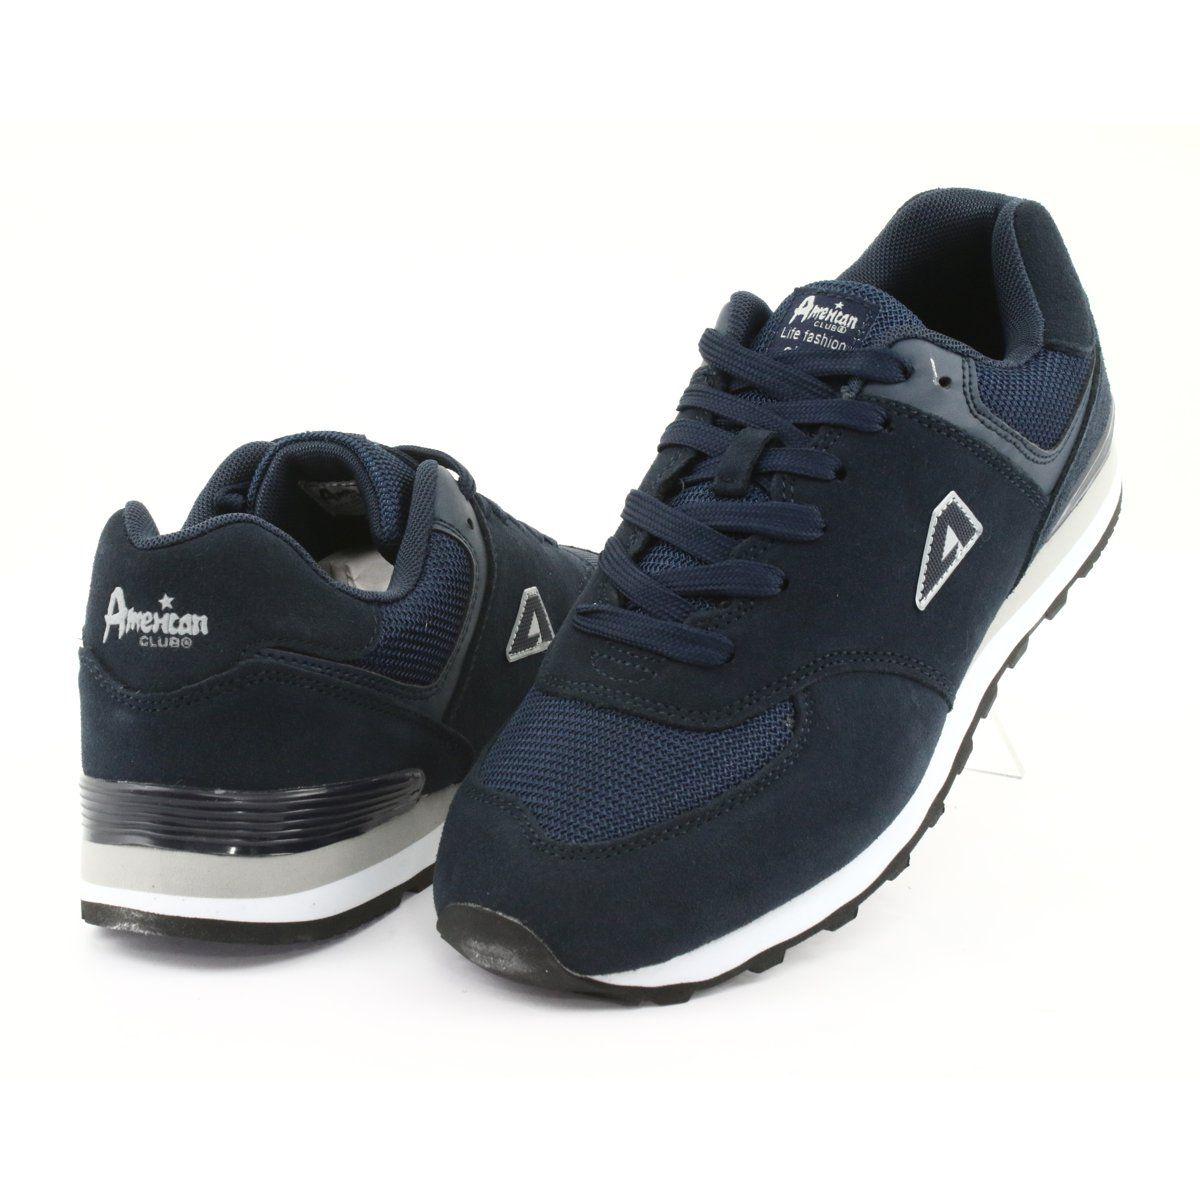 American Club Buty Sportowe Joggingi Ha27 Granatowe Comfortable Shoes Club Shoes Sports Shoes